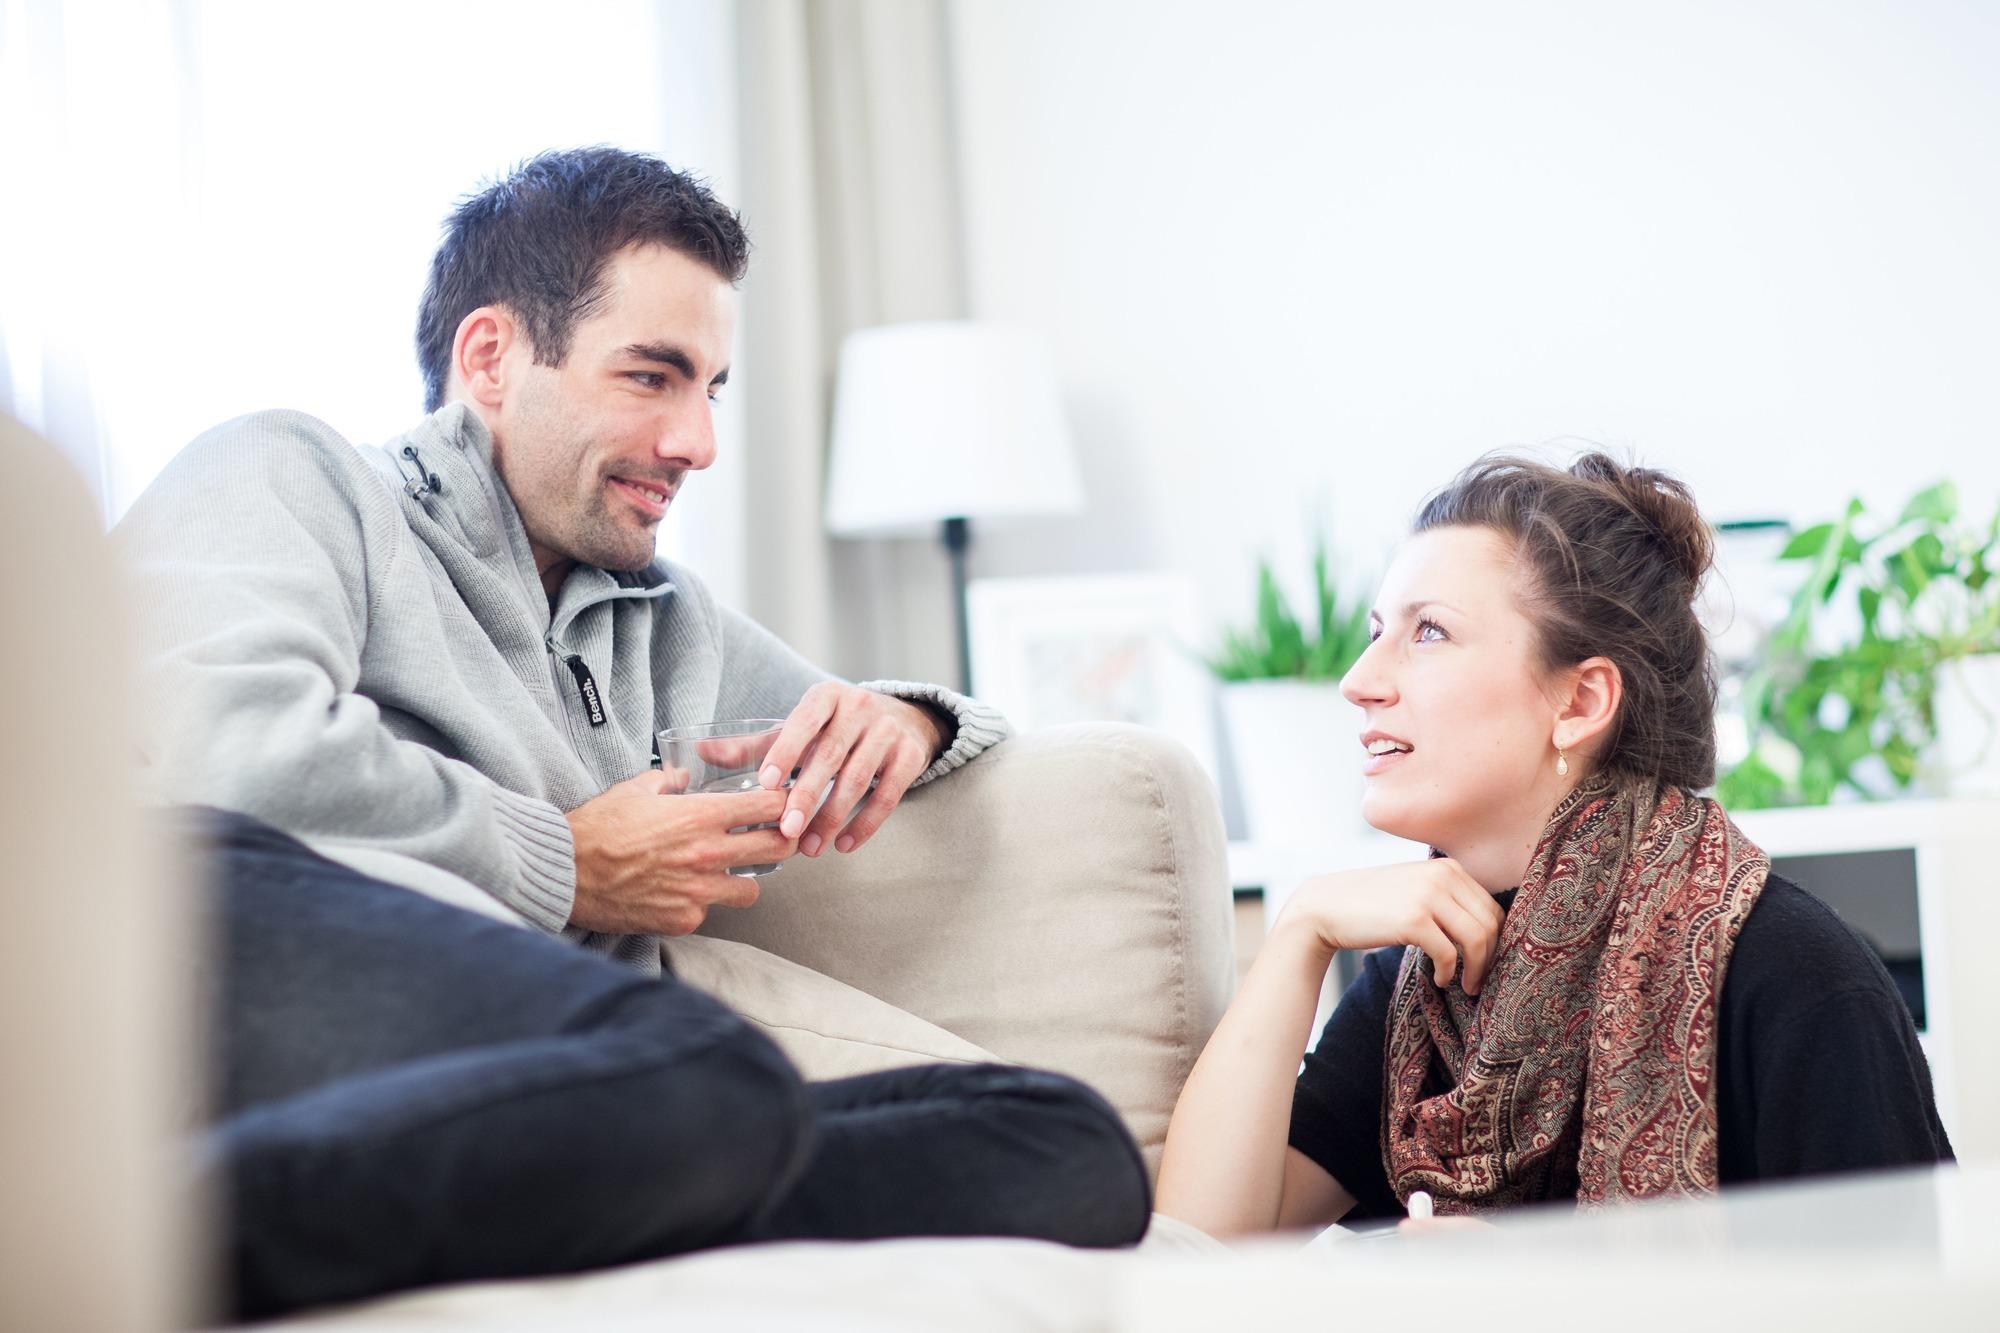 Andere beobachten Paare die Paare, Paare suchen